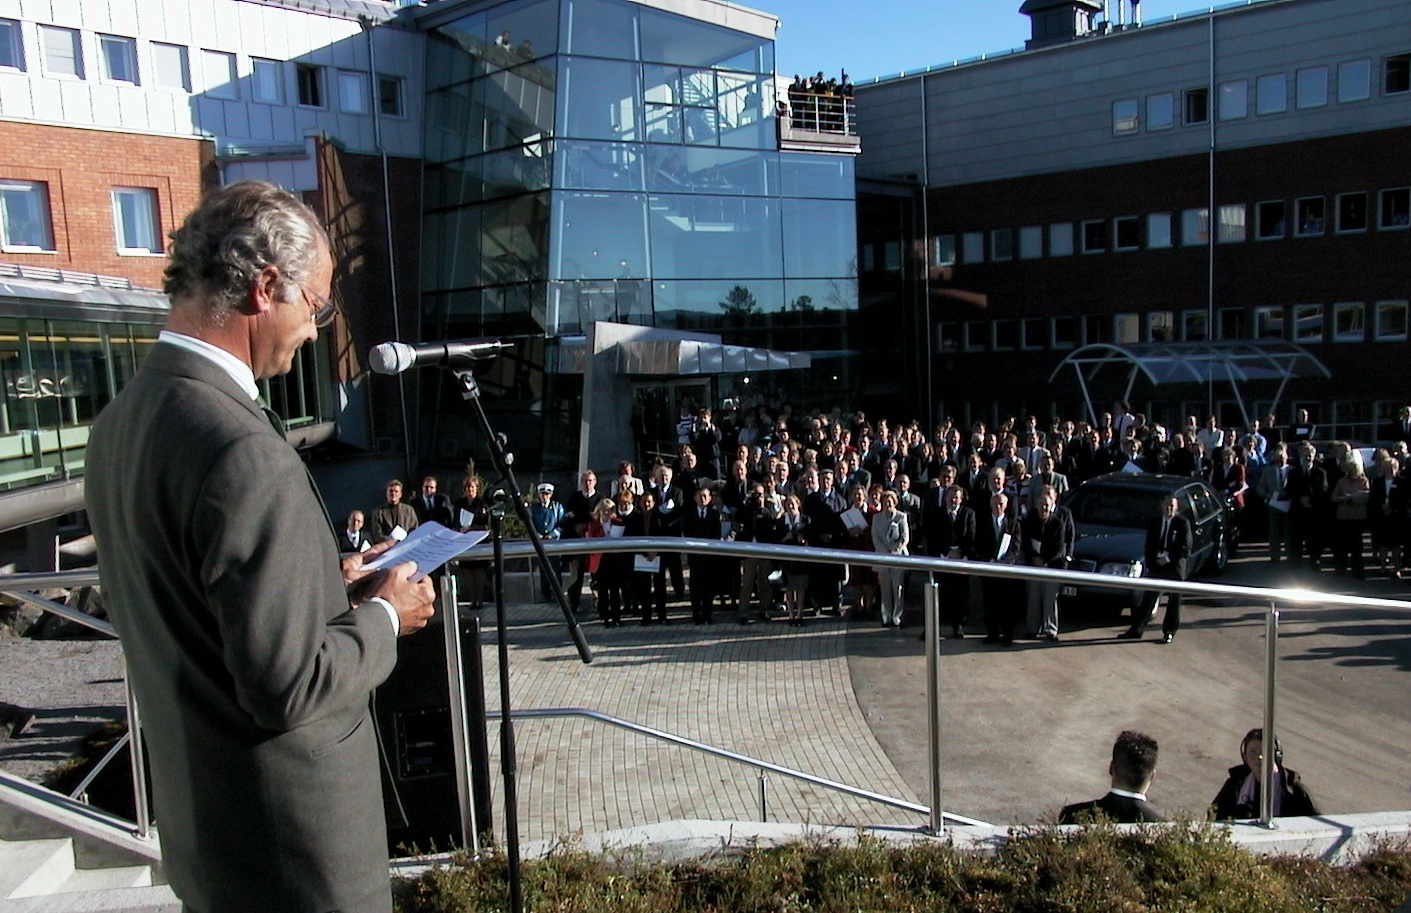 King Carl XVI Gustaf of Sweden. Photo: Torbjörn Lövgren, IRF